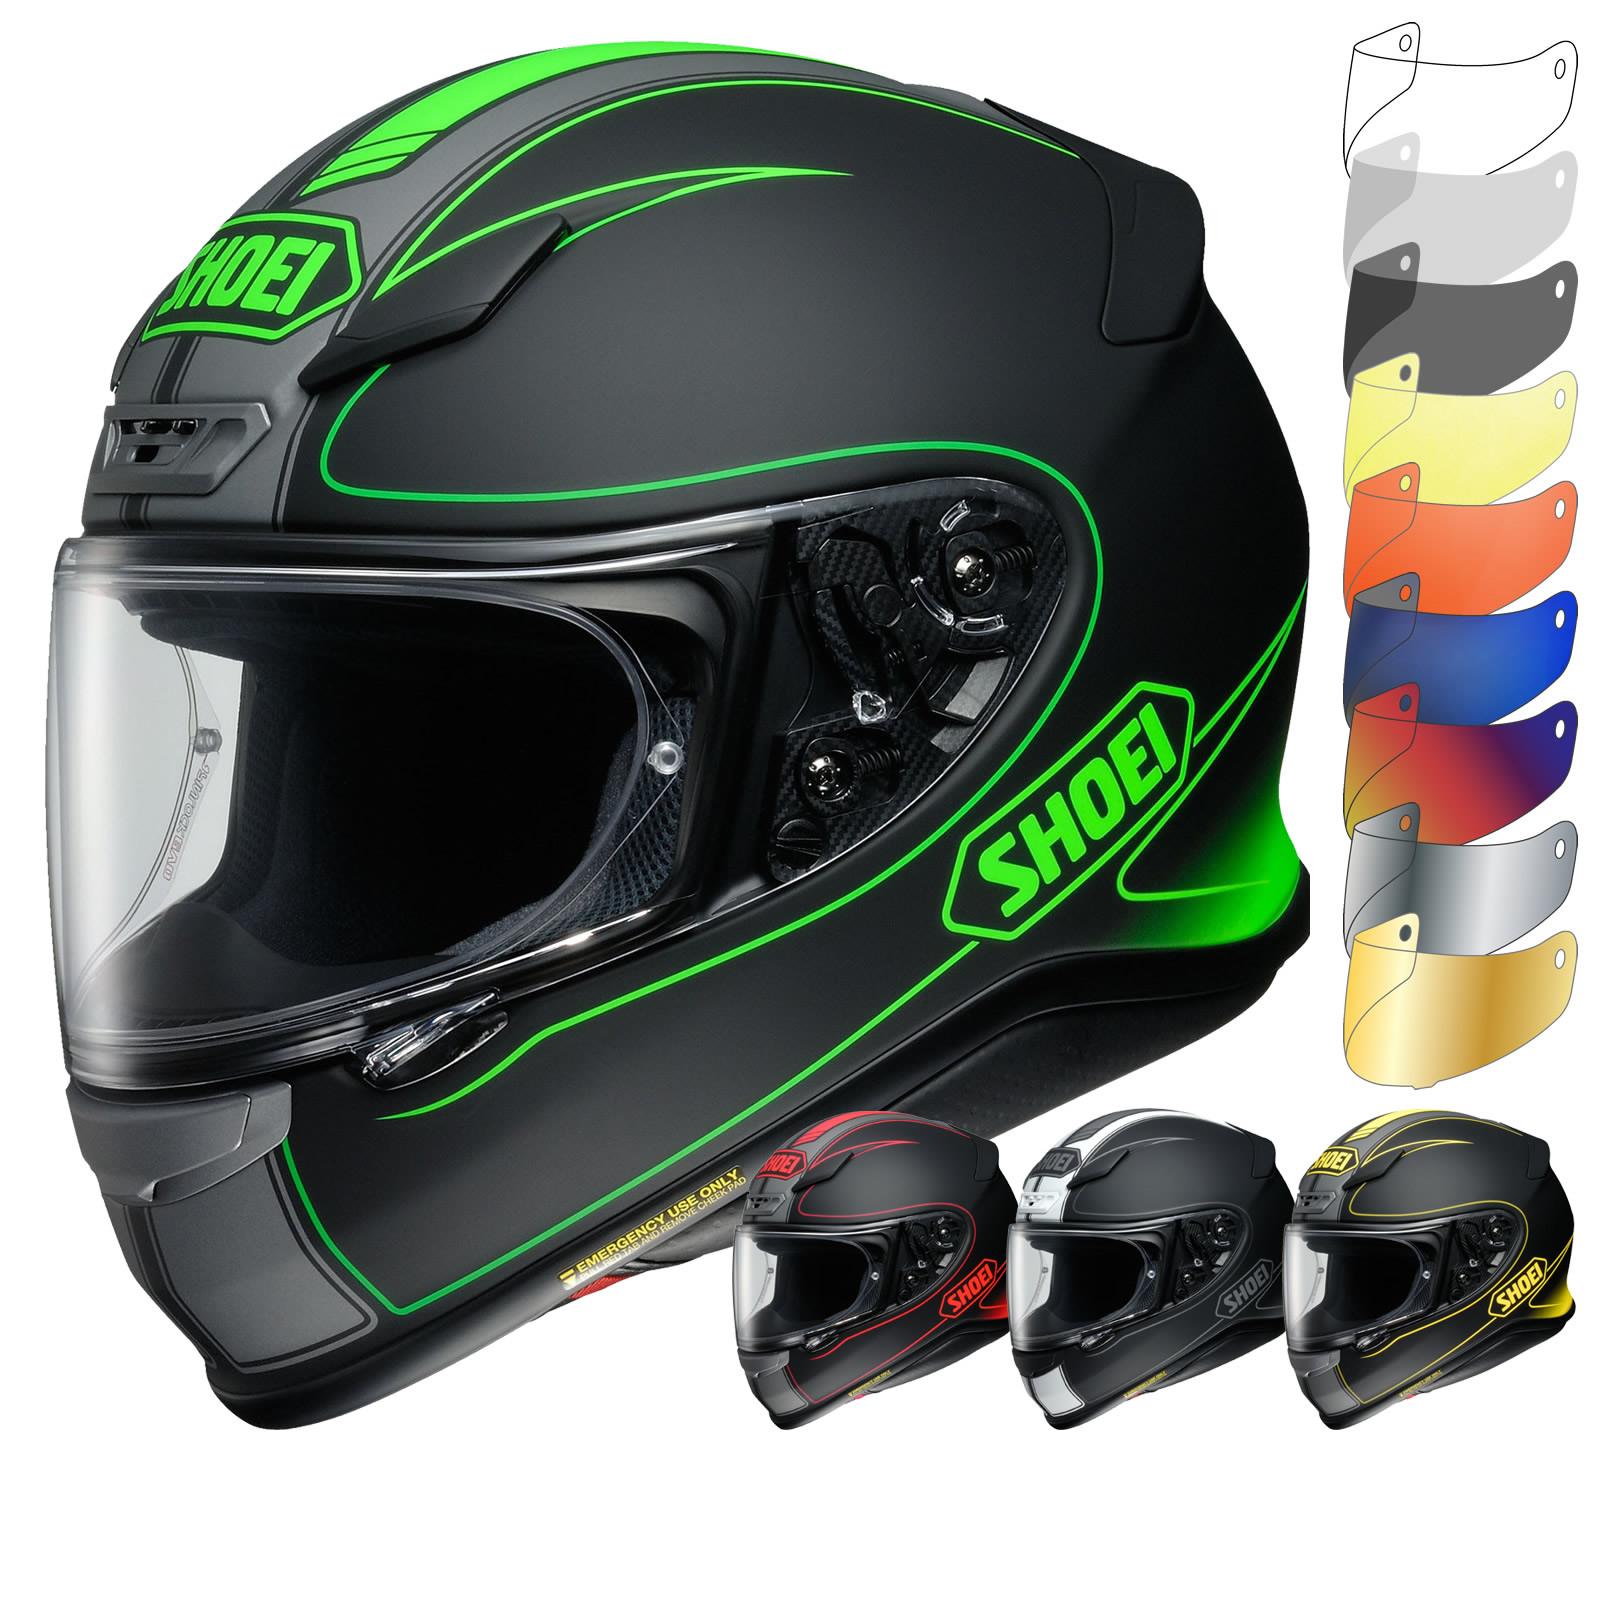 shoei nxr flagger full face motorcycle motorbike helmet. Black Bedroom Furniture Sets. Home Design Ideas